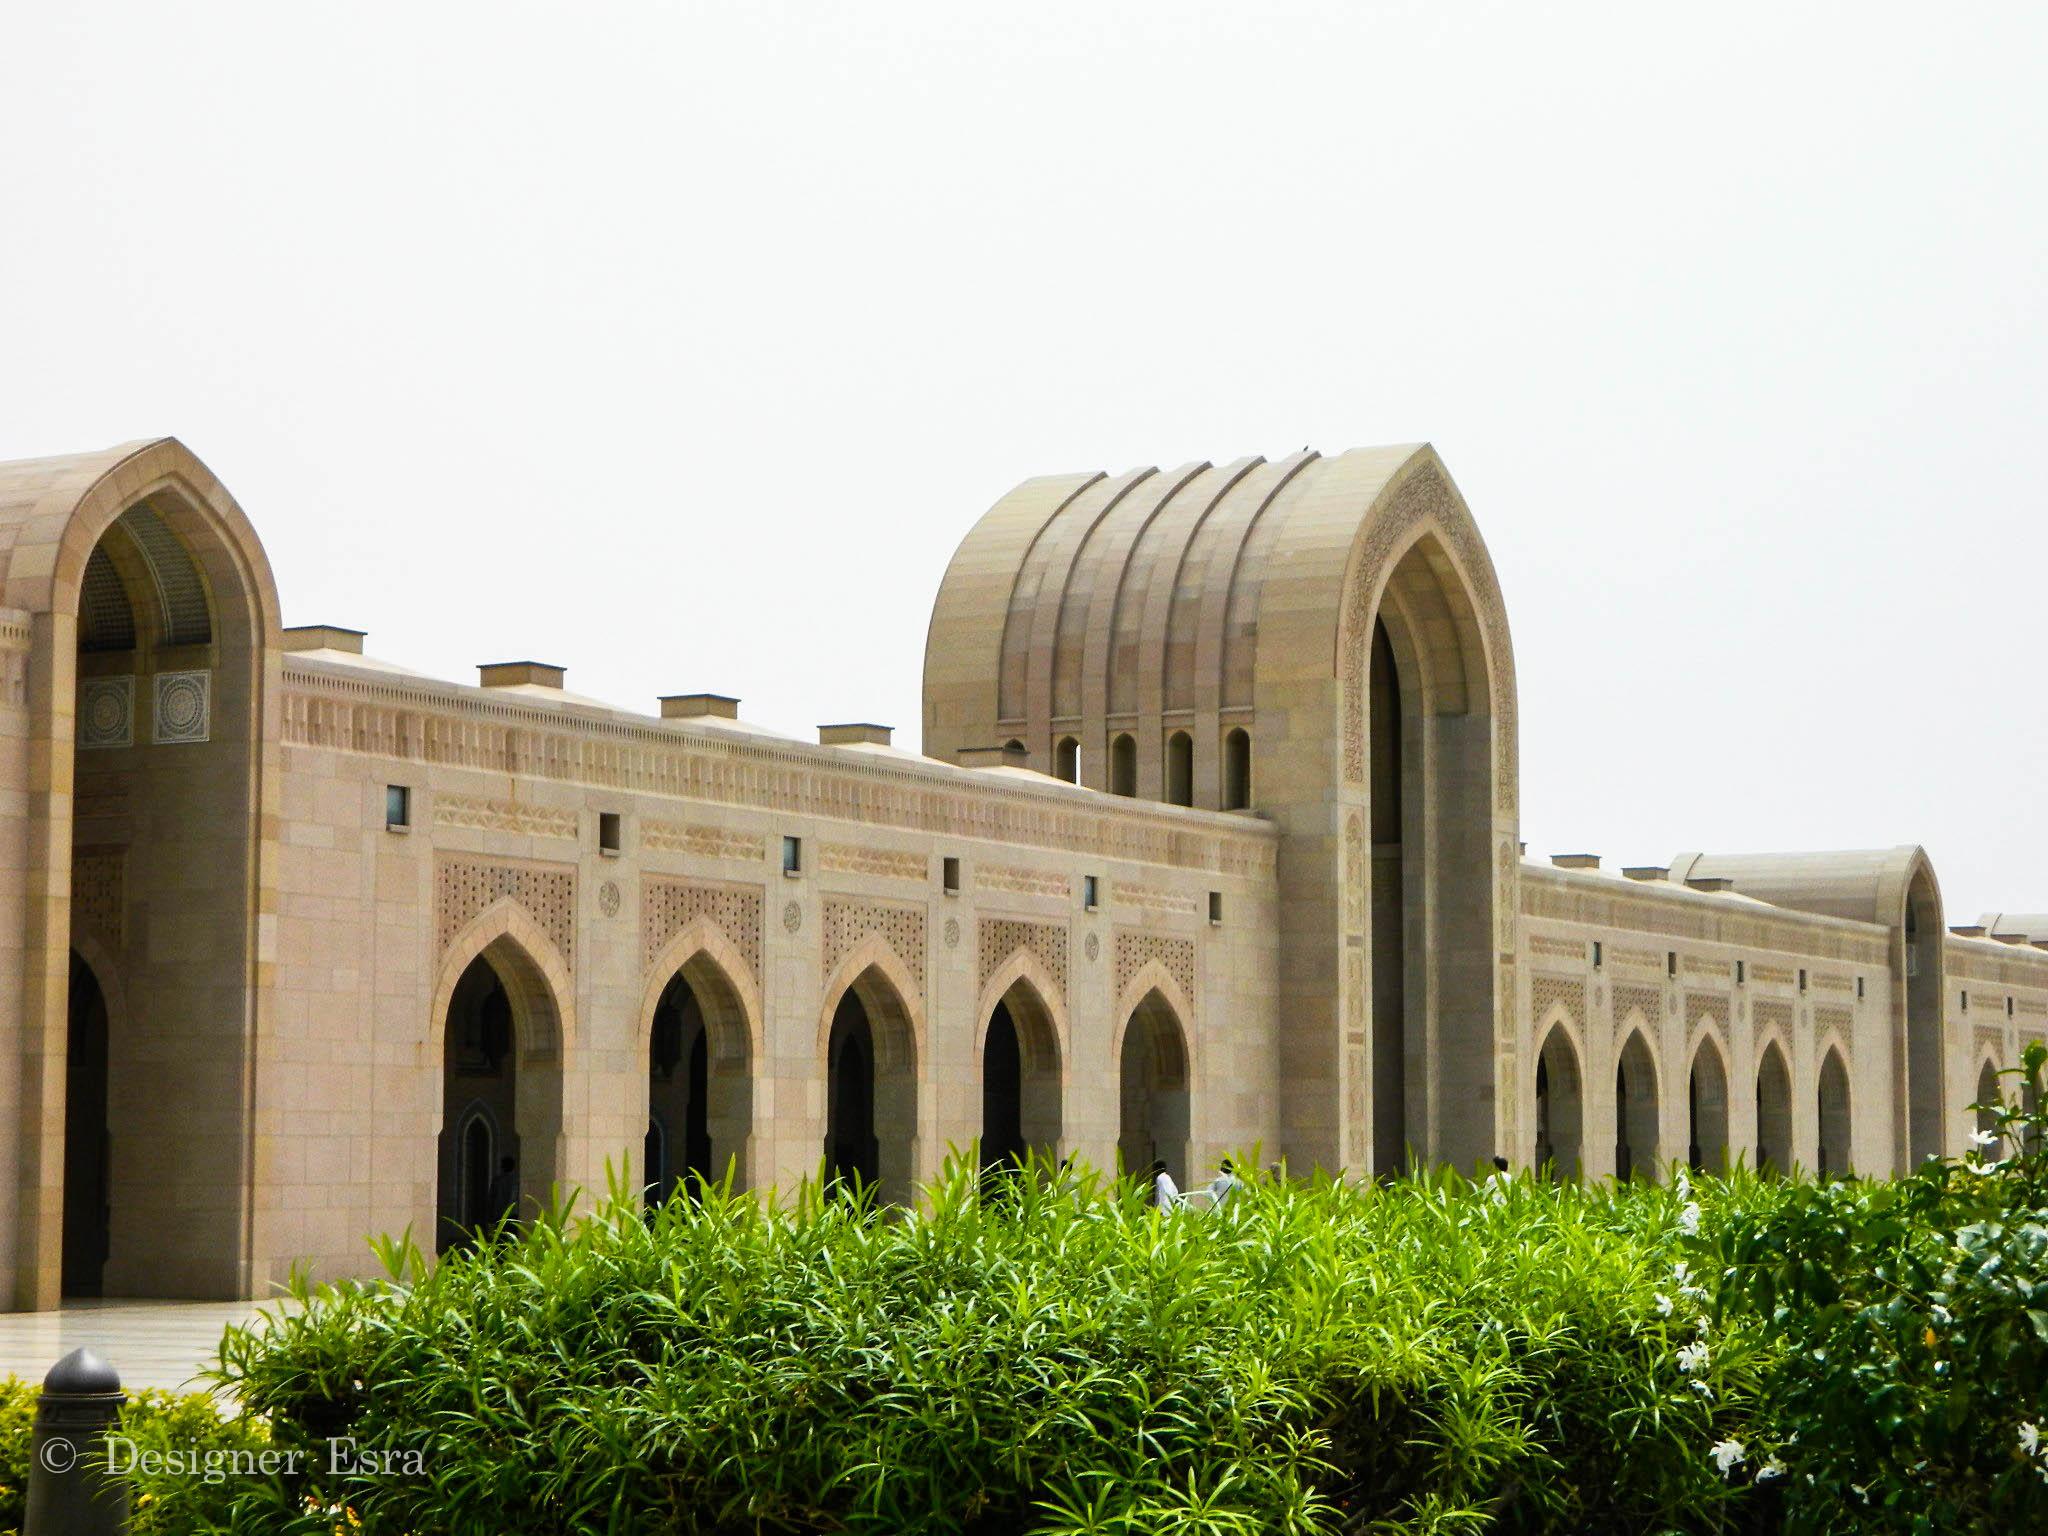 Sultan Qaboos's Grand Mosque